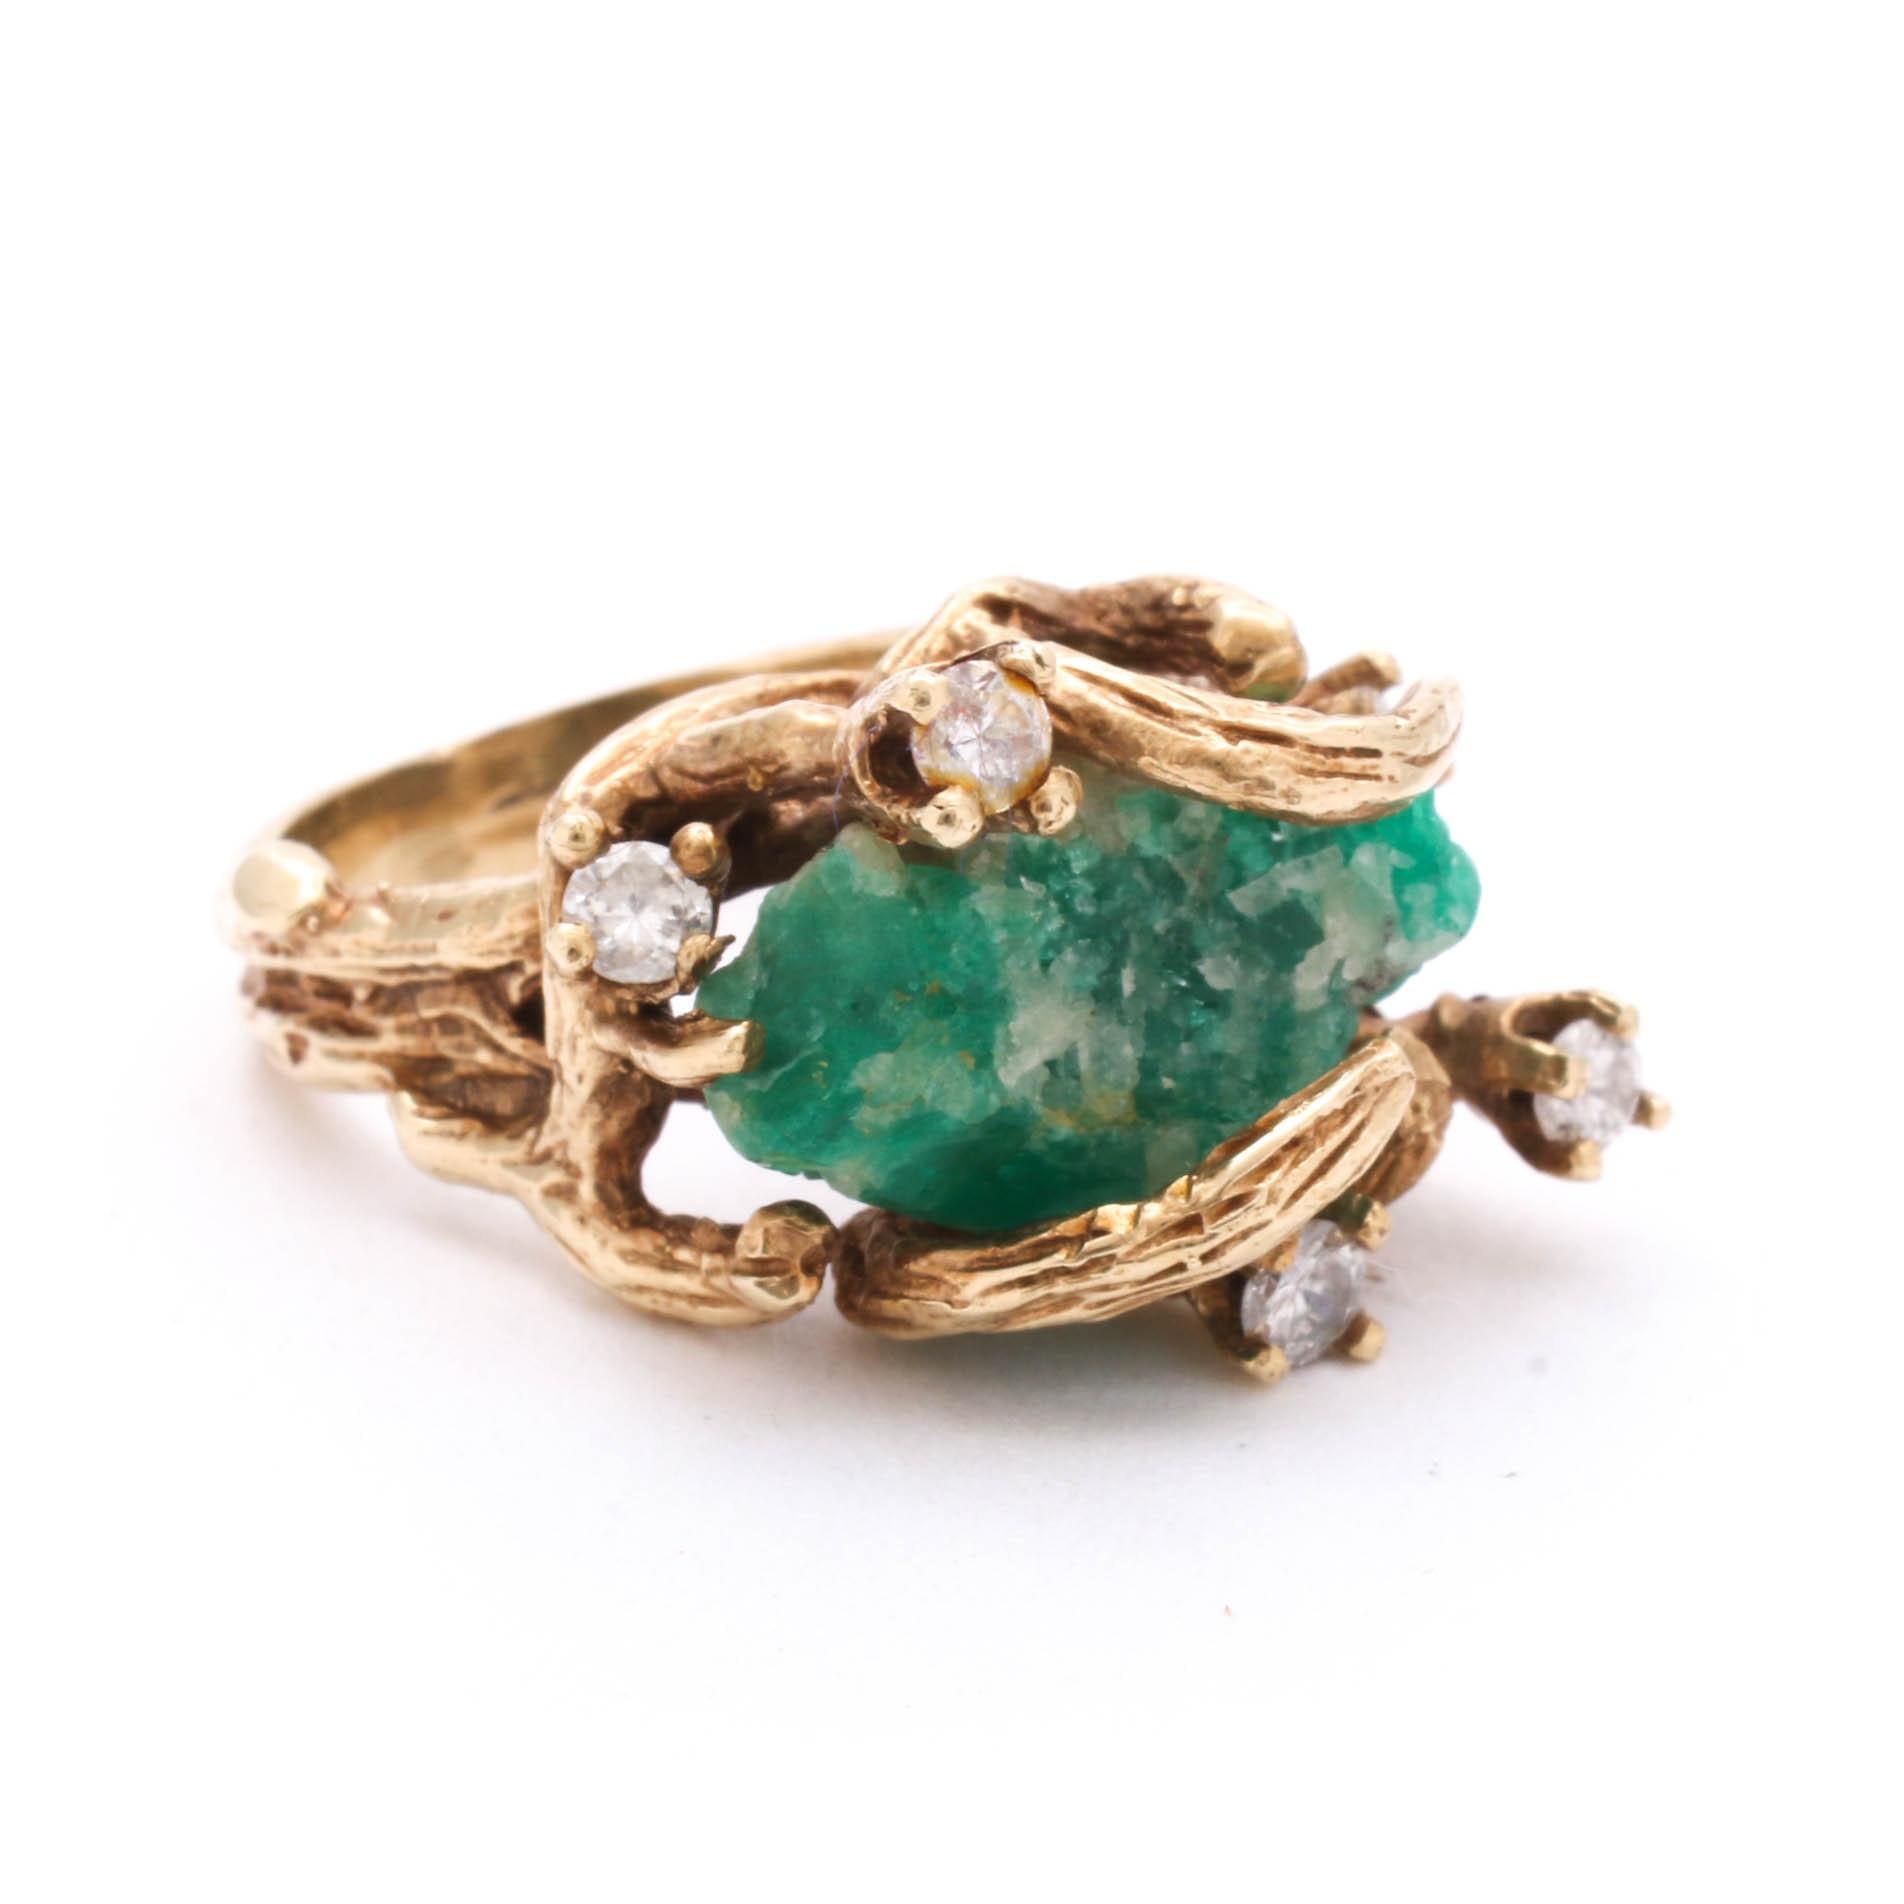 14K Yellow Gold Rough-Cut Emerald and Diamond Ring